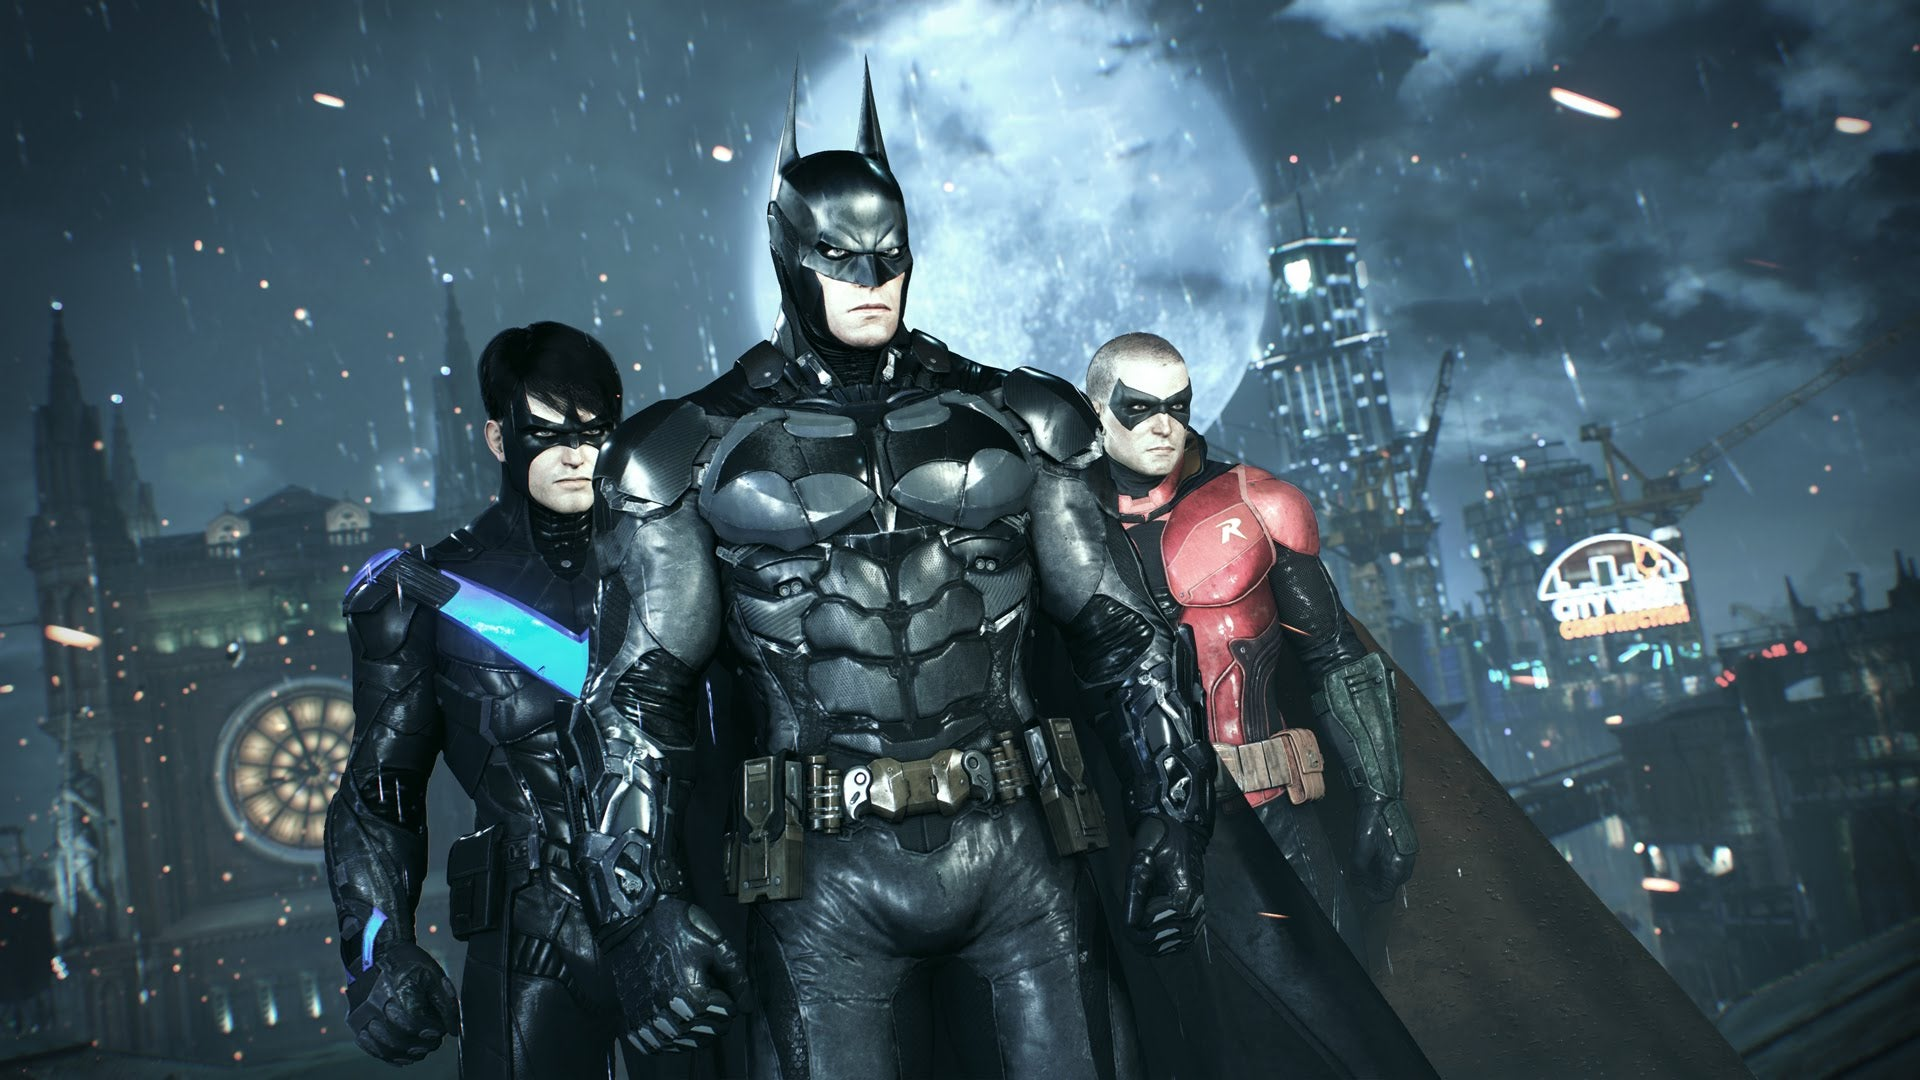 batman arkham knight sidekicks 140657